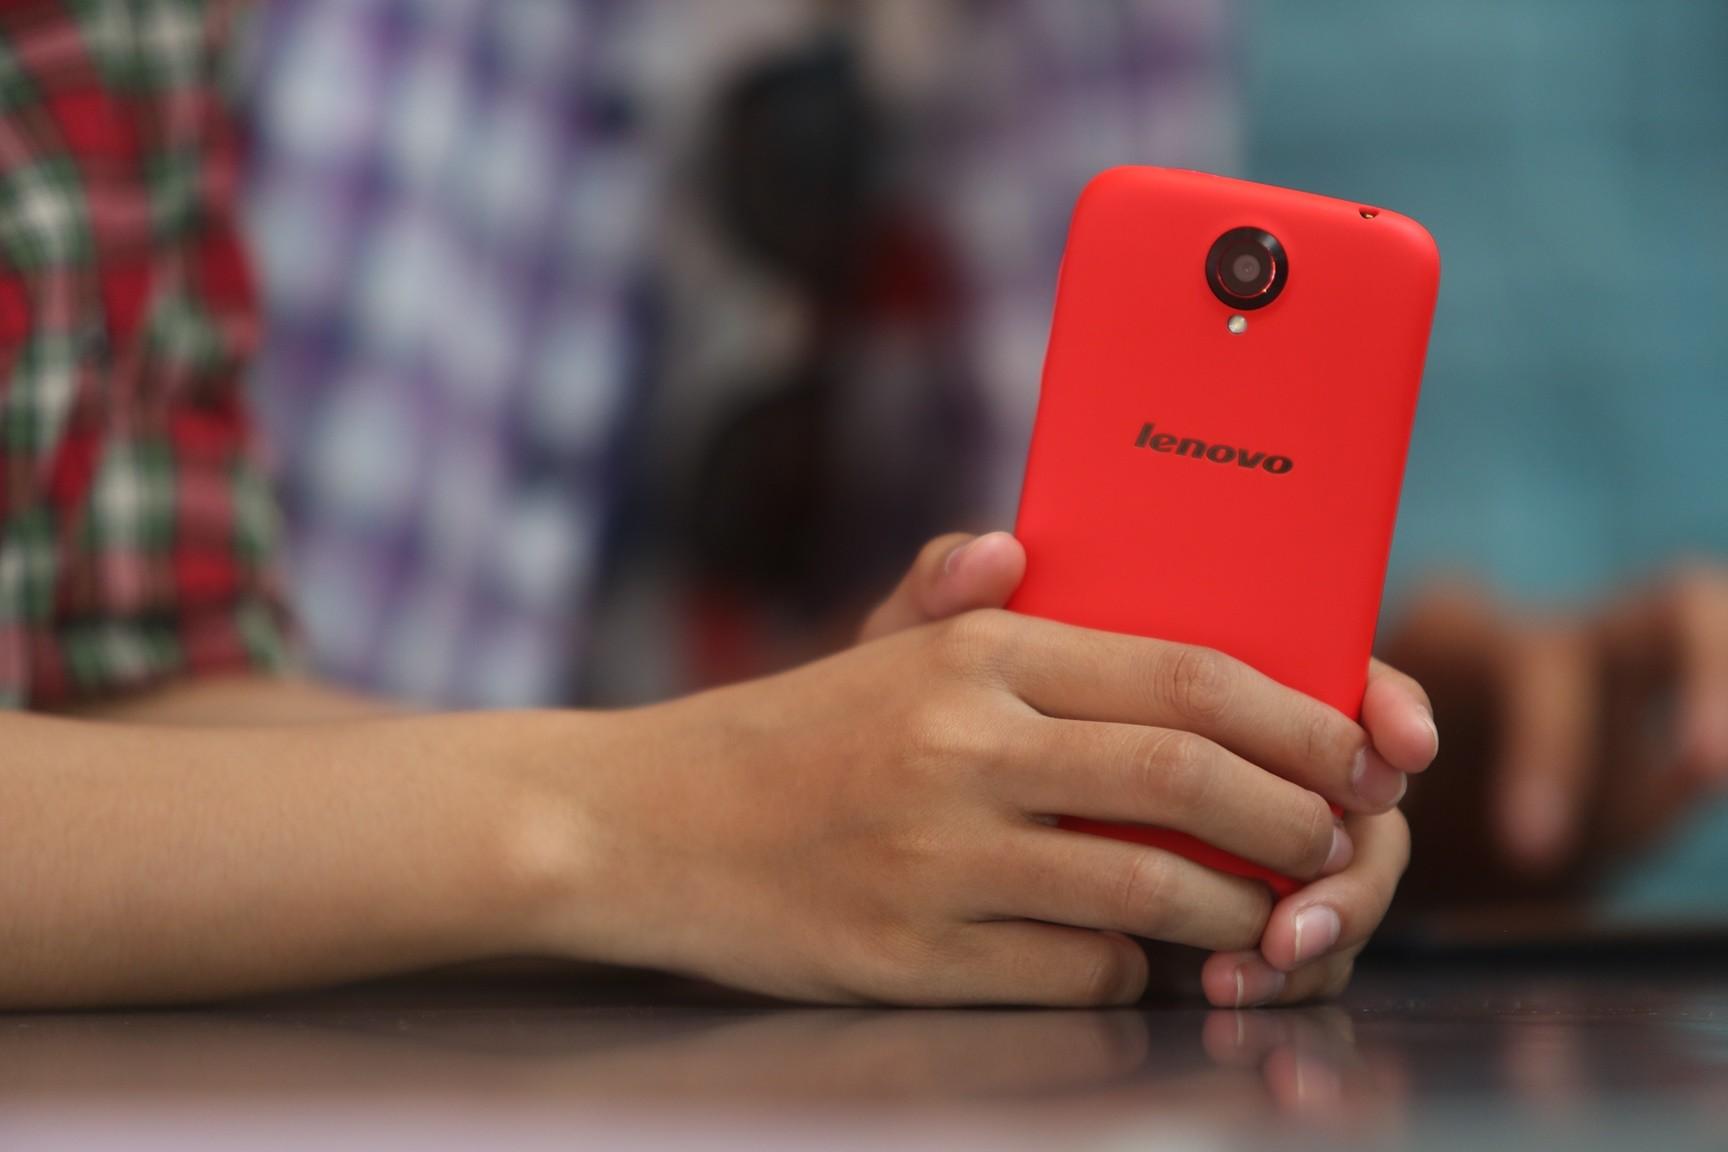 S820 12 - Cơ hội du lịch Brazil khi mua smartphone Lenovo